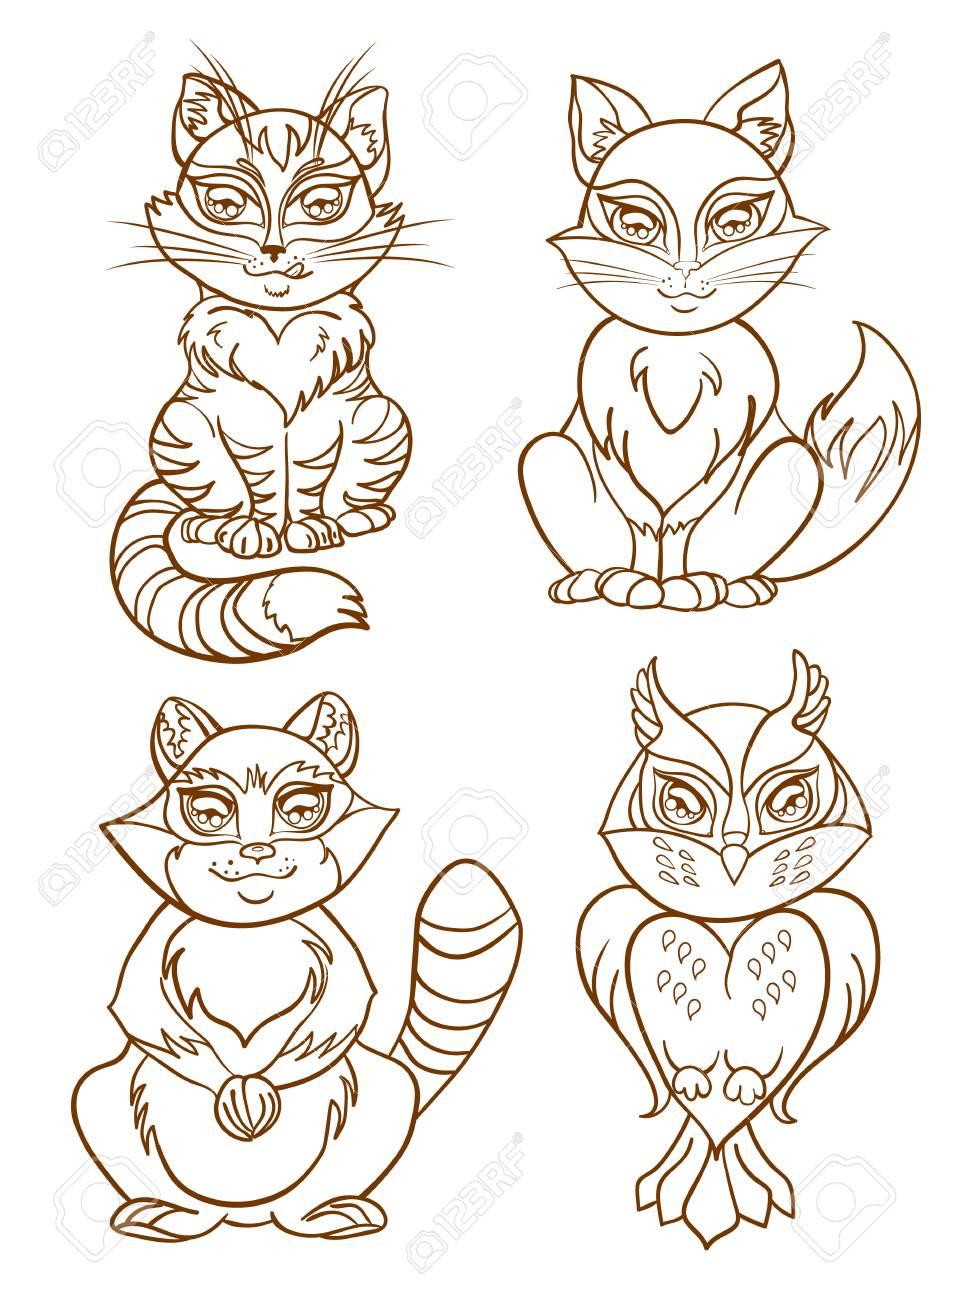 Animal Mignon Mis La Conception De Style De Dessin Animé Imprimer